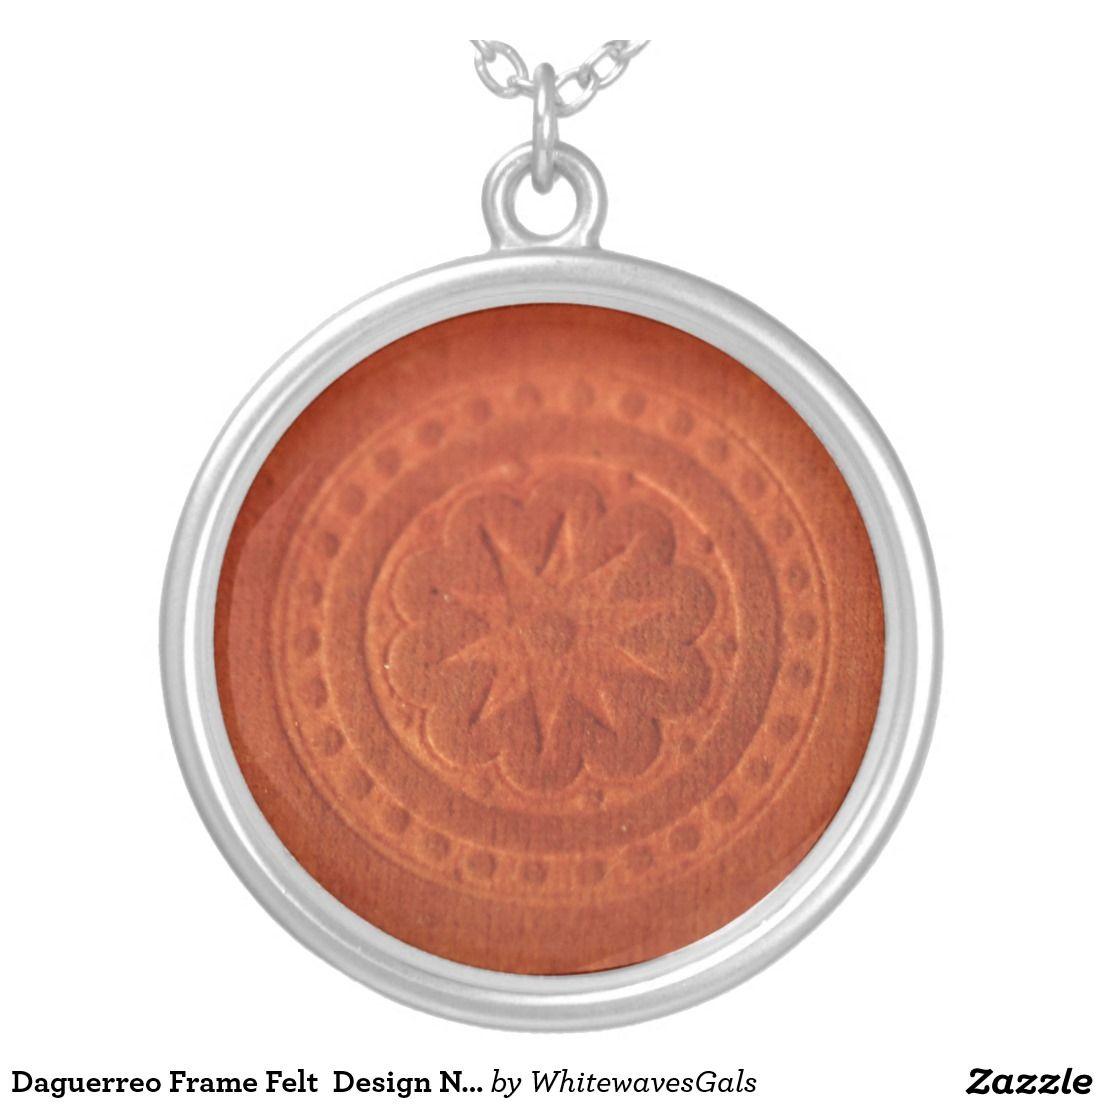 Sentimental Wedding Gift Ideas: Daguerreo Frame Felt Design Necklace